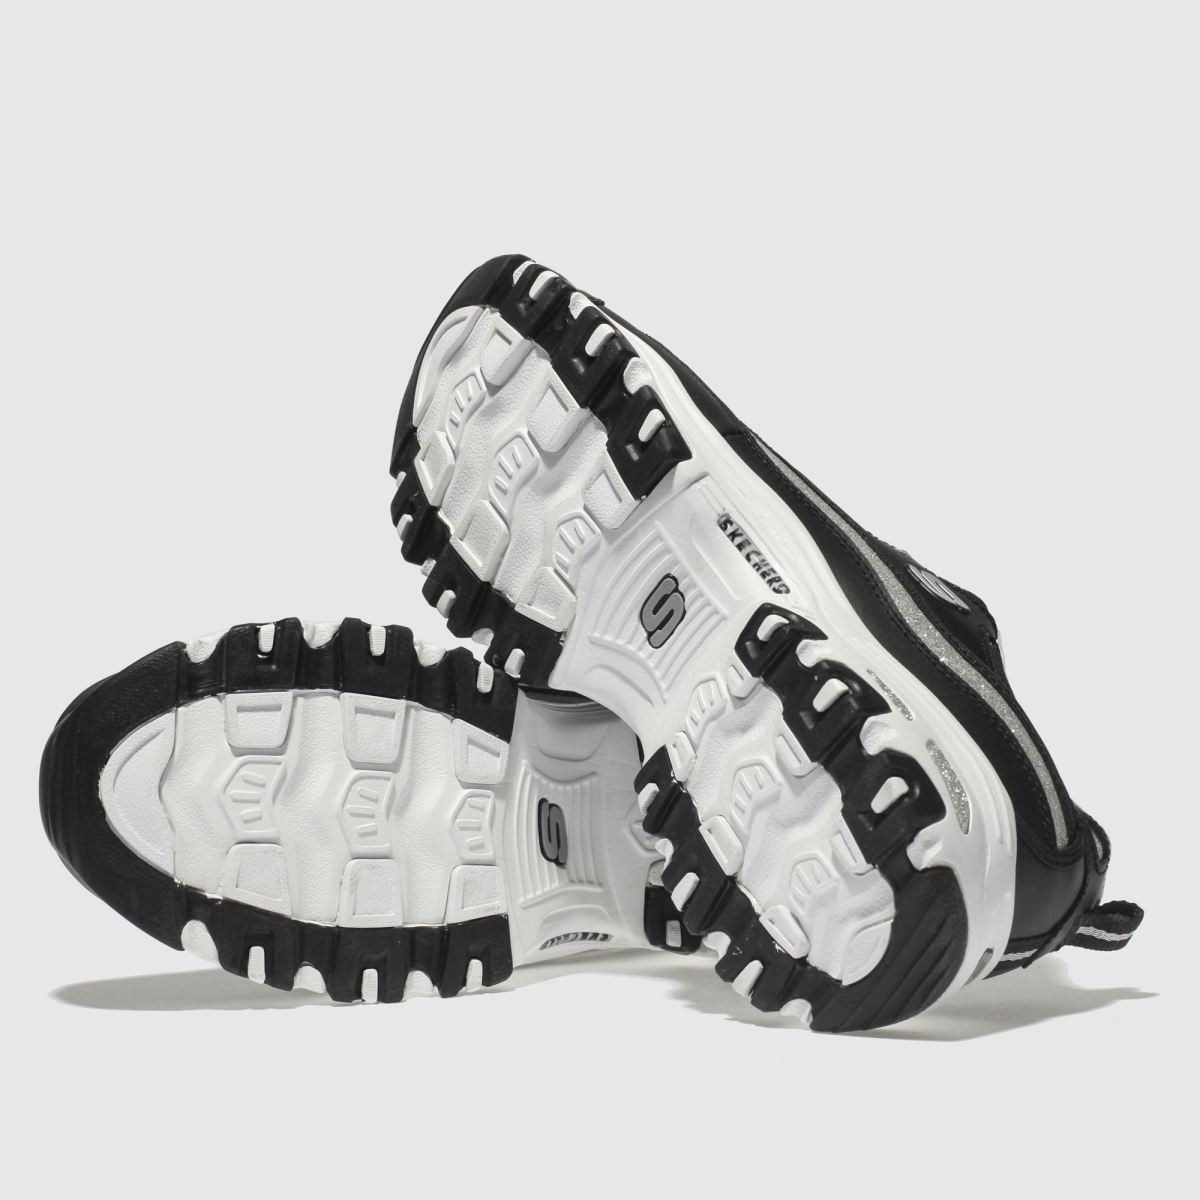 Damen schuh Schwarz-silber skechers Dlites Sneaker | schuh Damen Gute Qualität beliebte Schuhe 38d78c